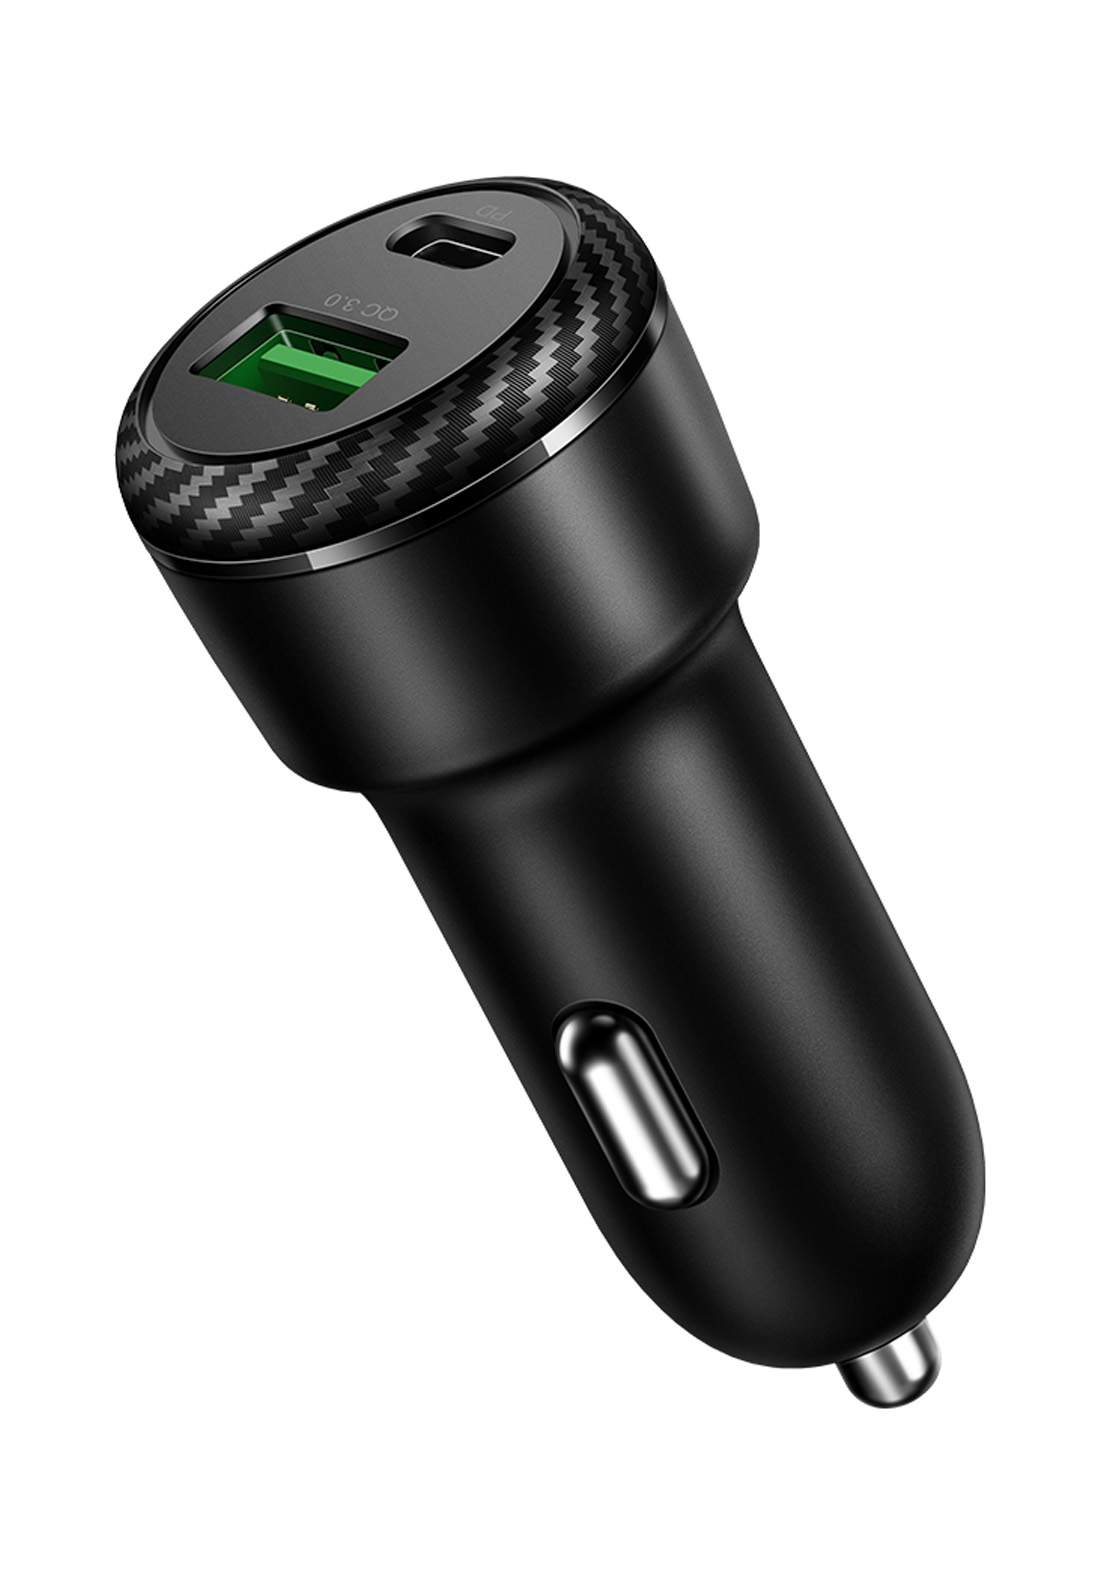 (2472)Mcdodo CC05970 Dual Port QC3.0 and Type-C PD Car Phone Charger 36W - Black شاحن موبايل  للسيارة